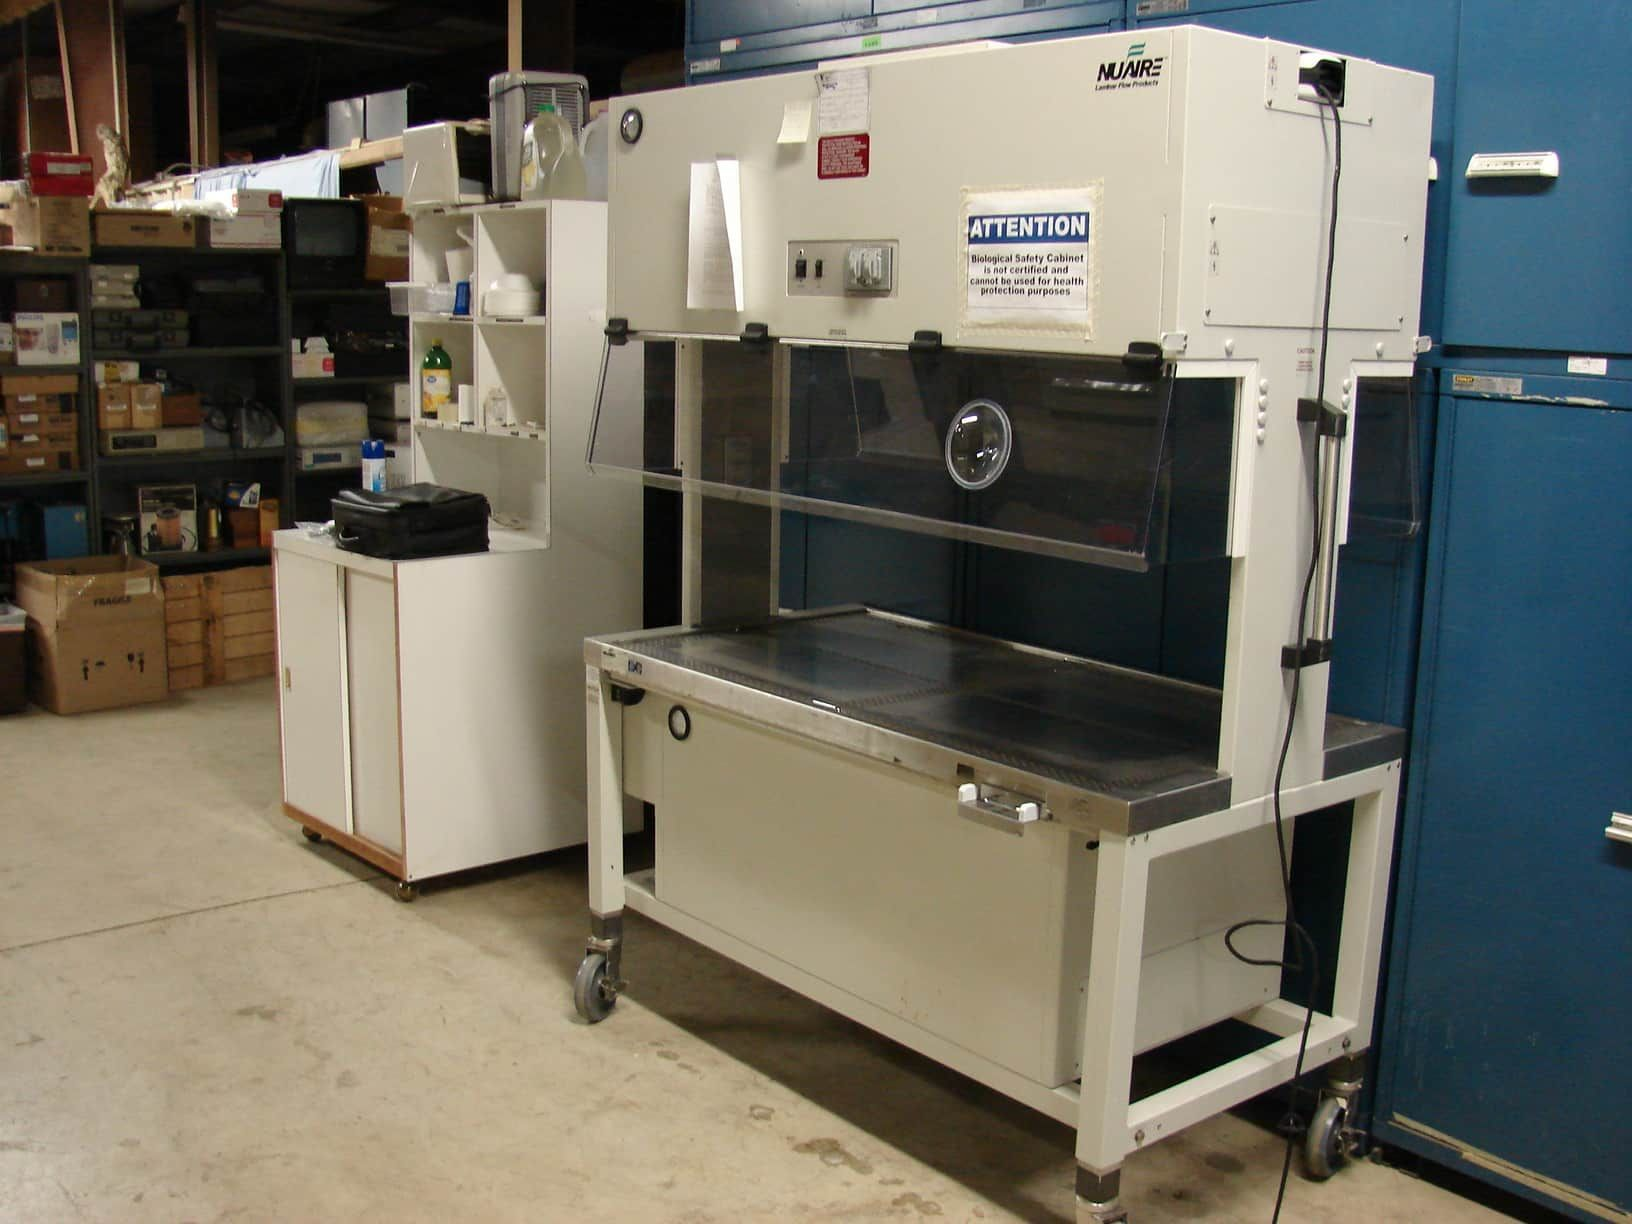 NuAire Model NU S612 500 Hood Safety Cabinet Animal Transfer Station